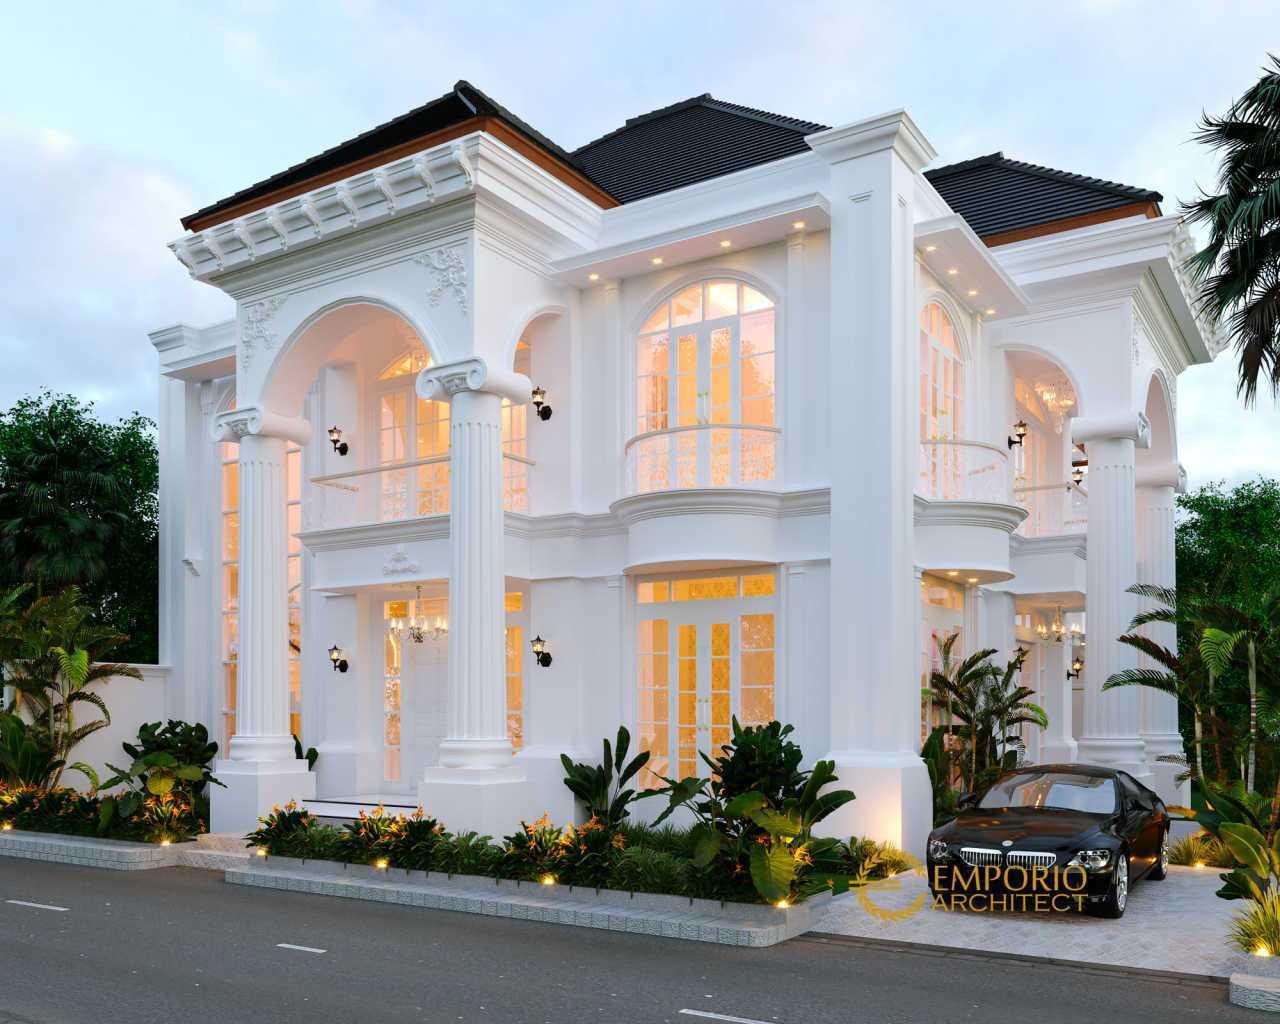 Emporio Architect Jasa Arsitek Denpasar Desain Rumah Classic 2 Lantai 685 @ Denpasar, Bali Kota Denpasar, Bali, Indonesia Kota Denpasar, Bali, Indonesia Emporio-Architect-Jasa-Arsitek-Denpasar-Desain-Rumah-Classic-2-Lantai-685-Denpasar-Bali Classic  93999